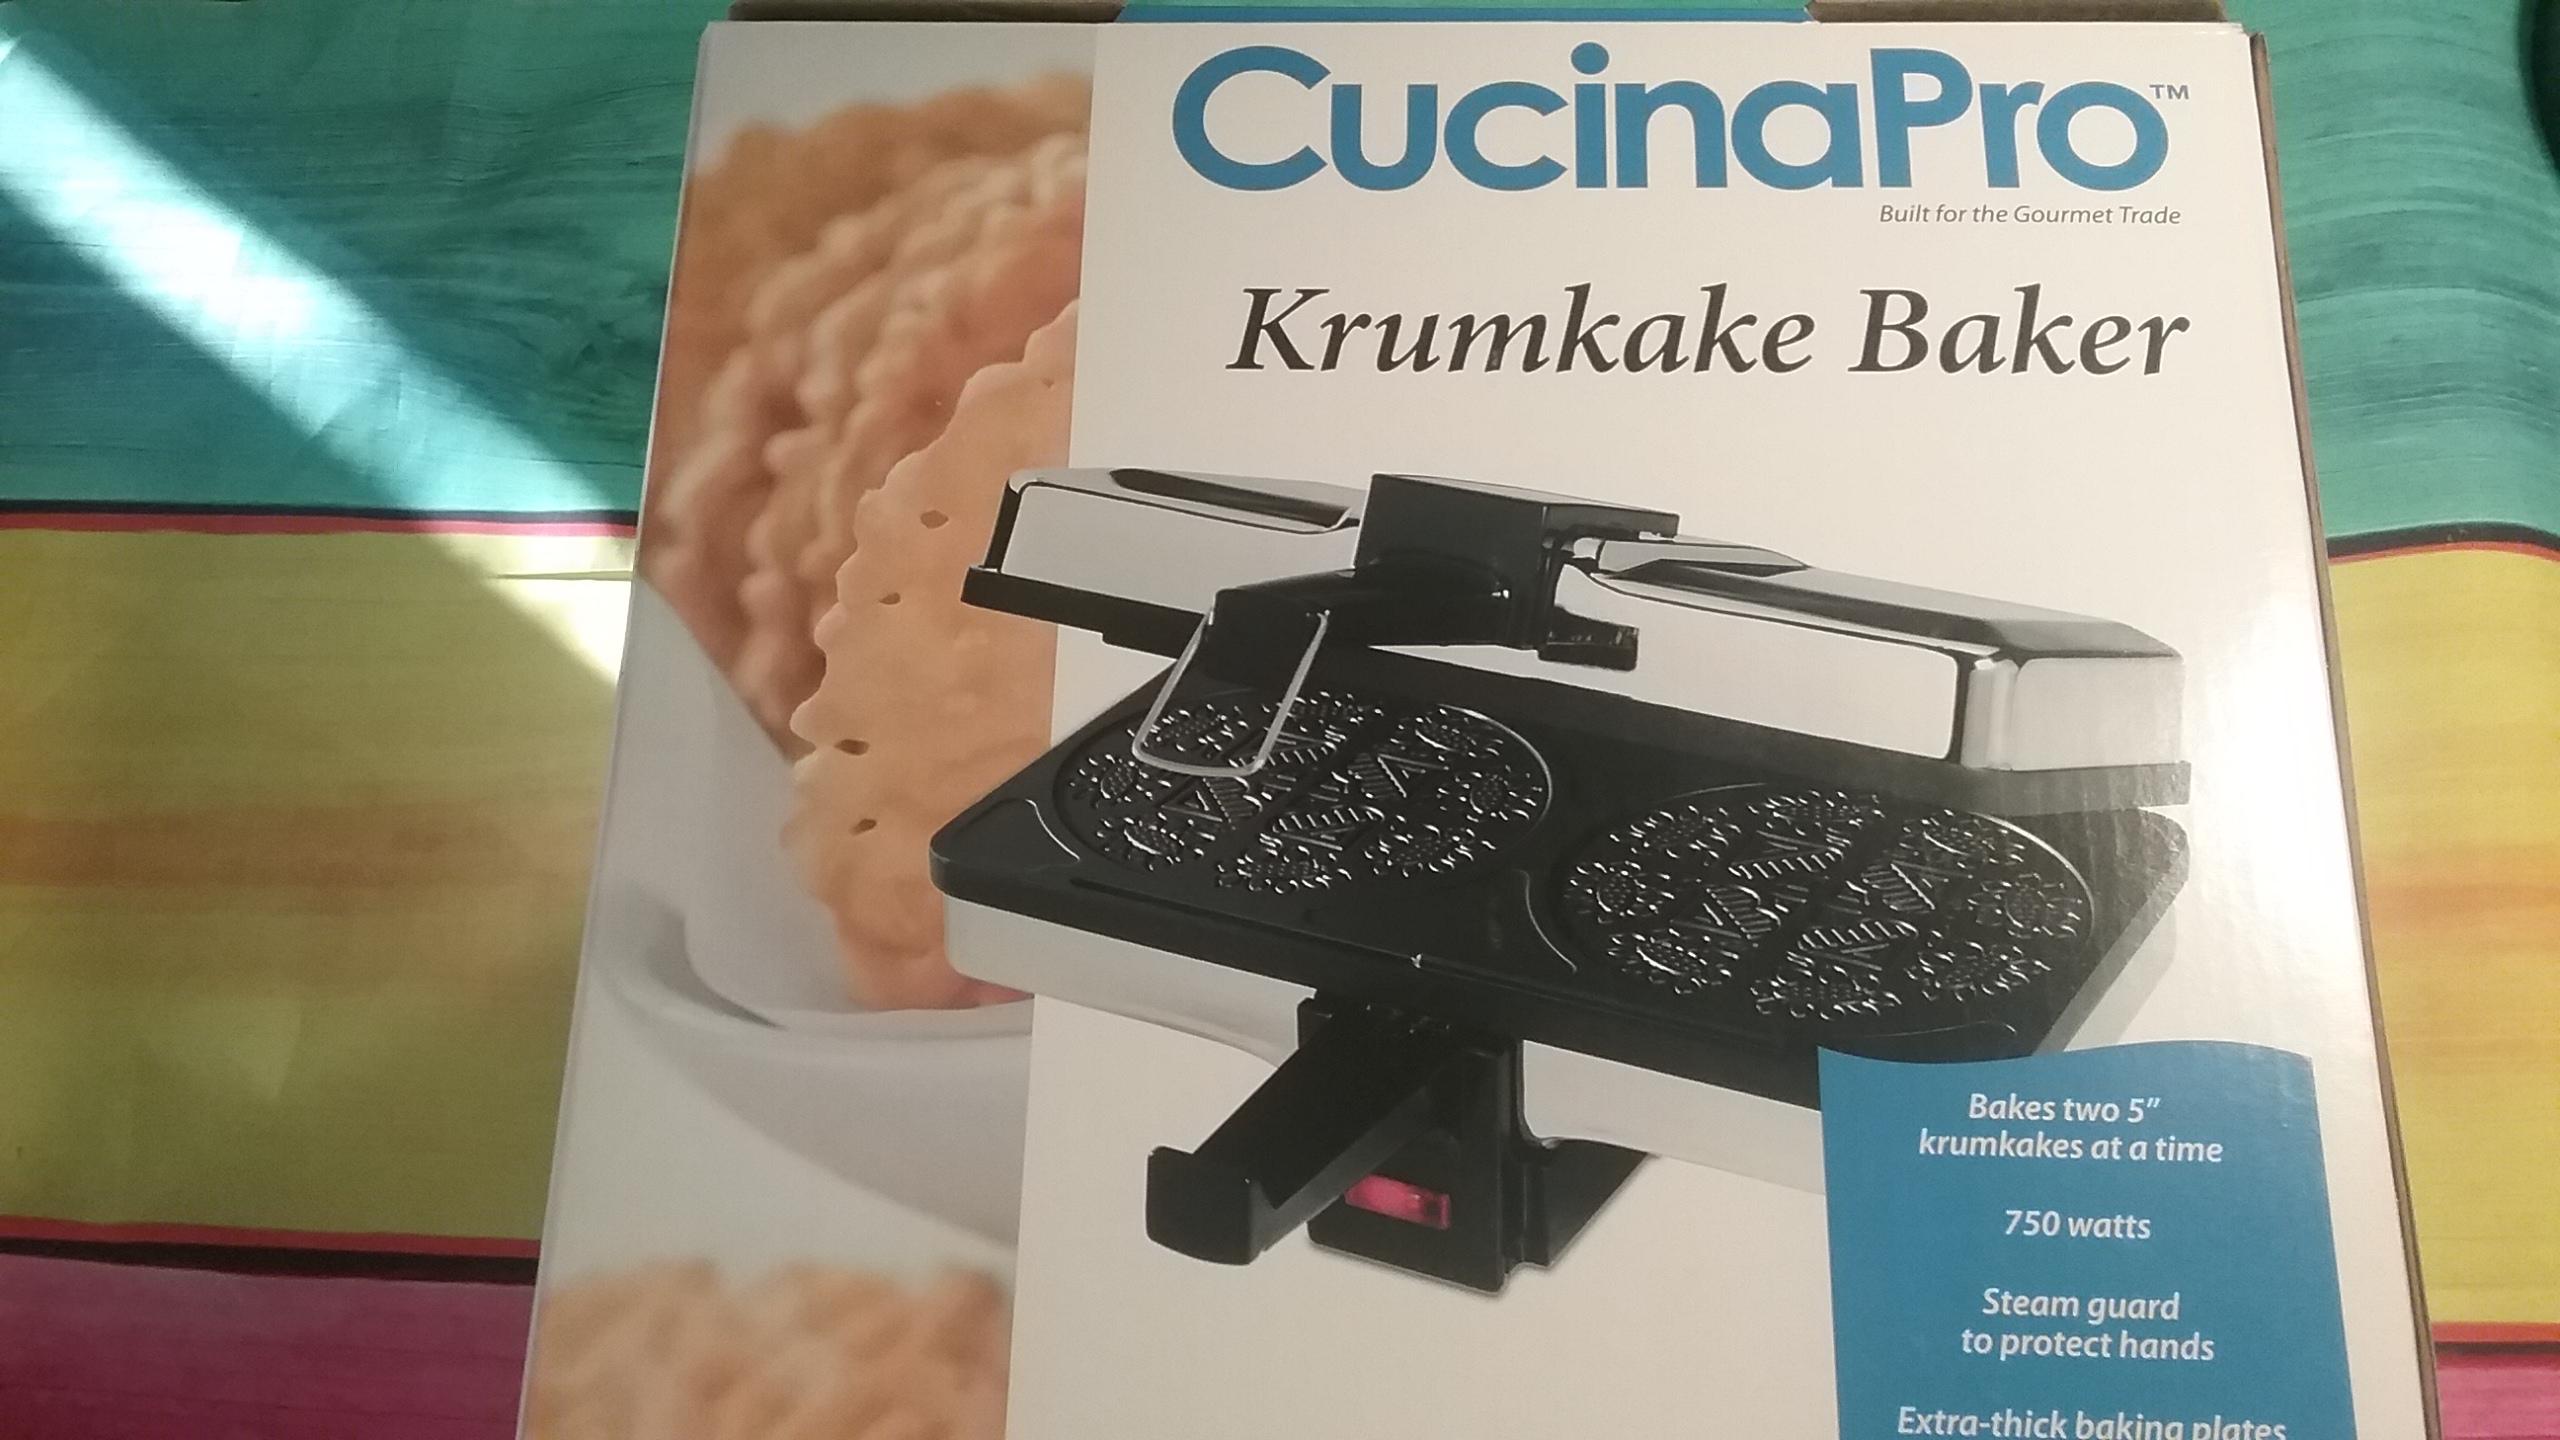 2016 Holiday Gift Guide CucinaPro Bubble Waffle Maker, Krumkake Baker.